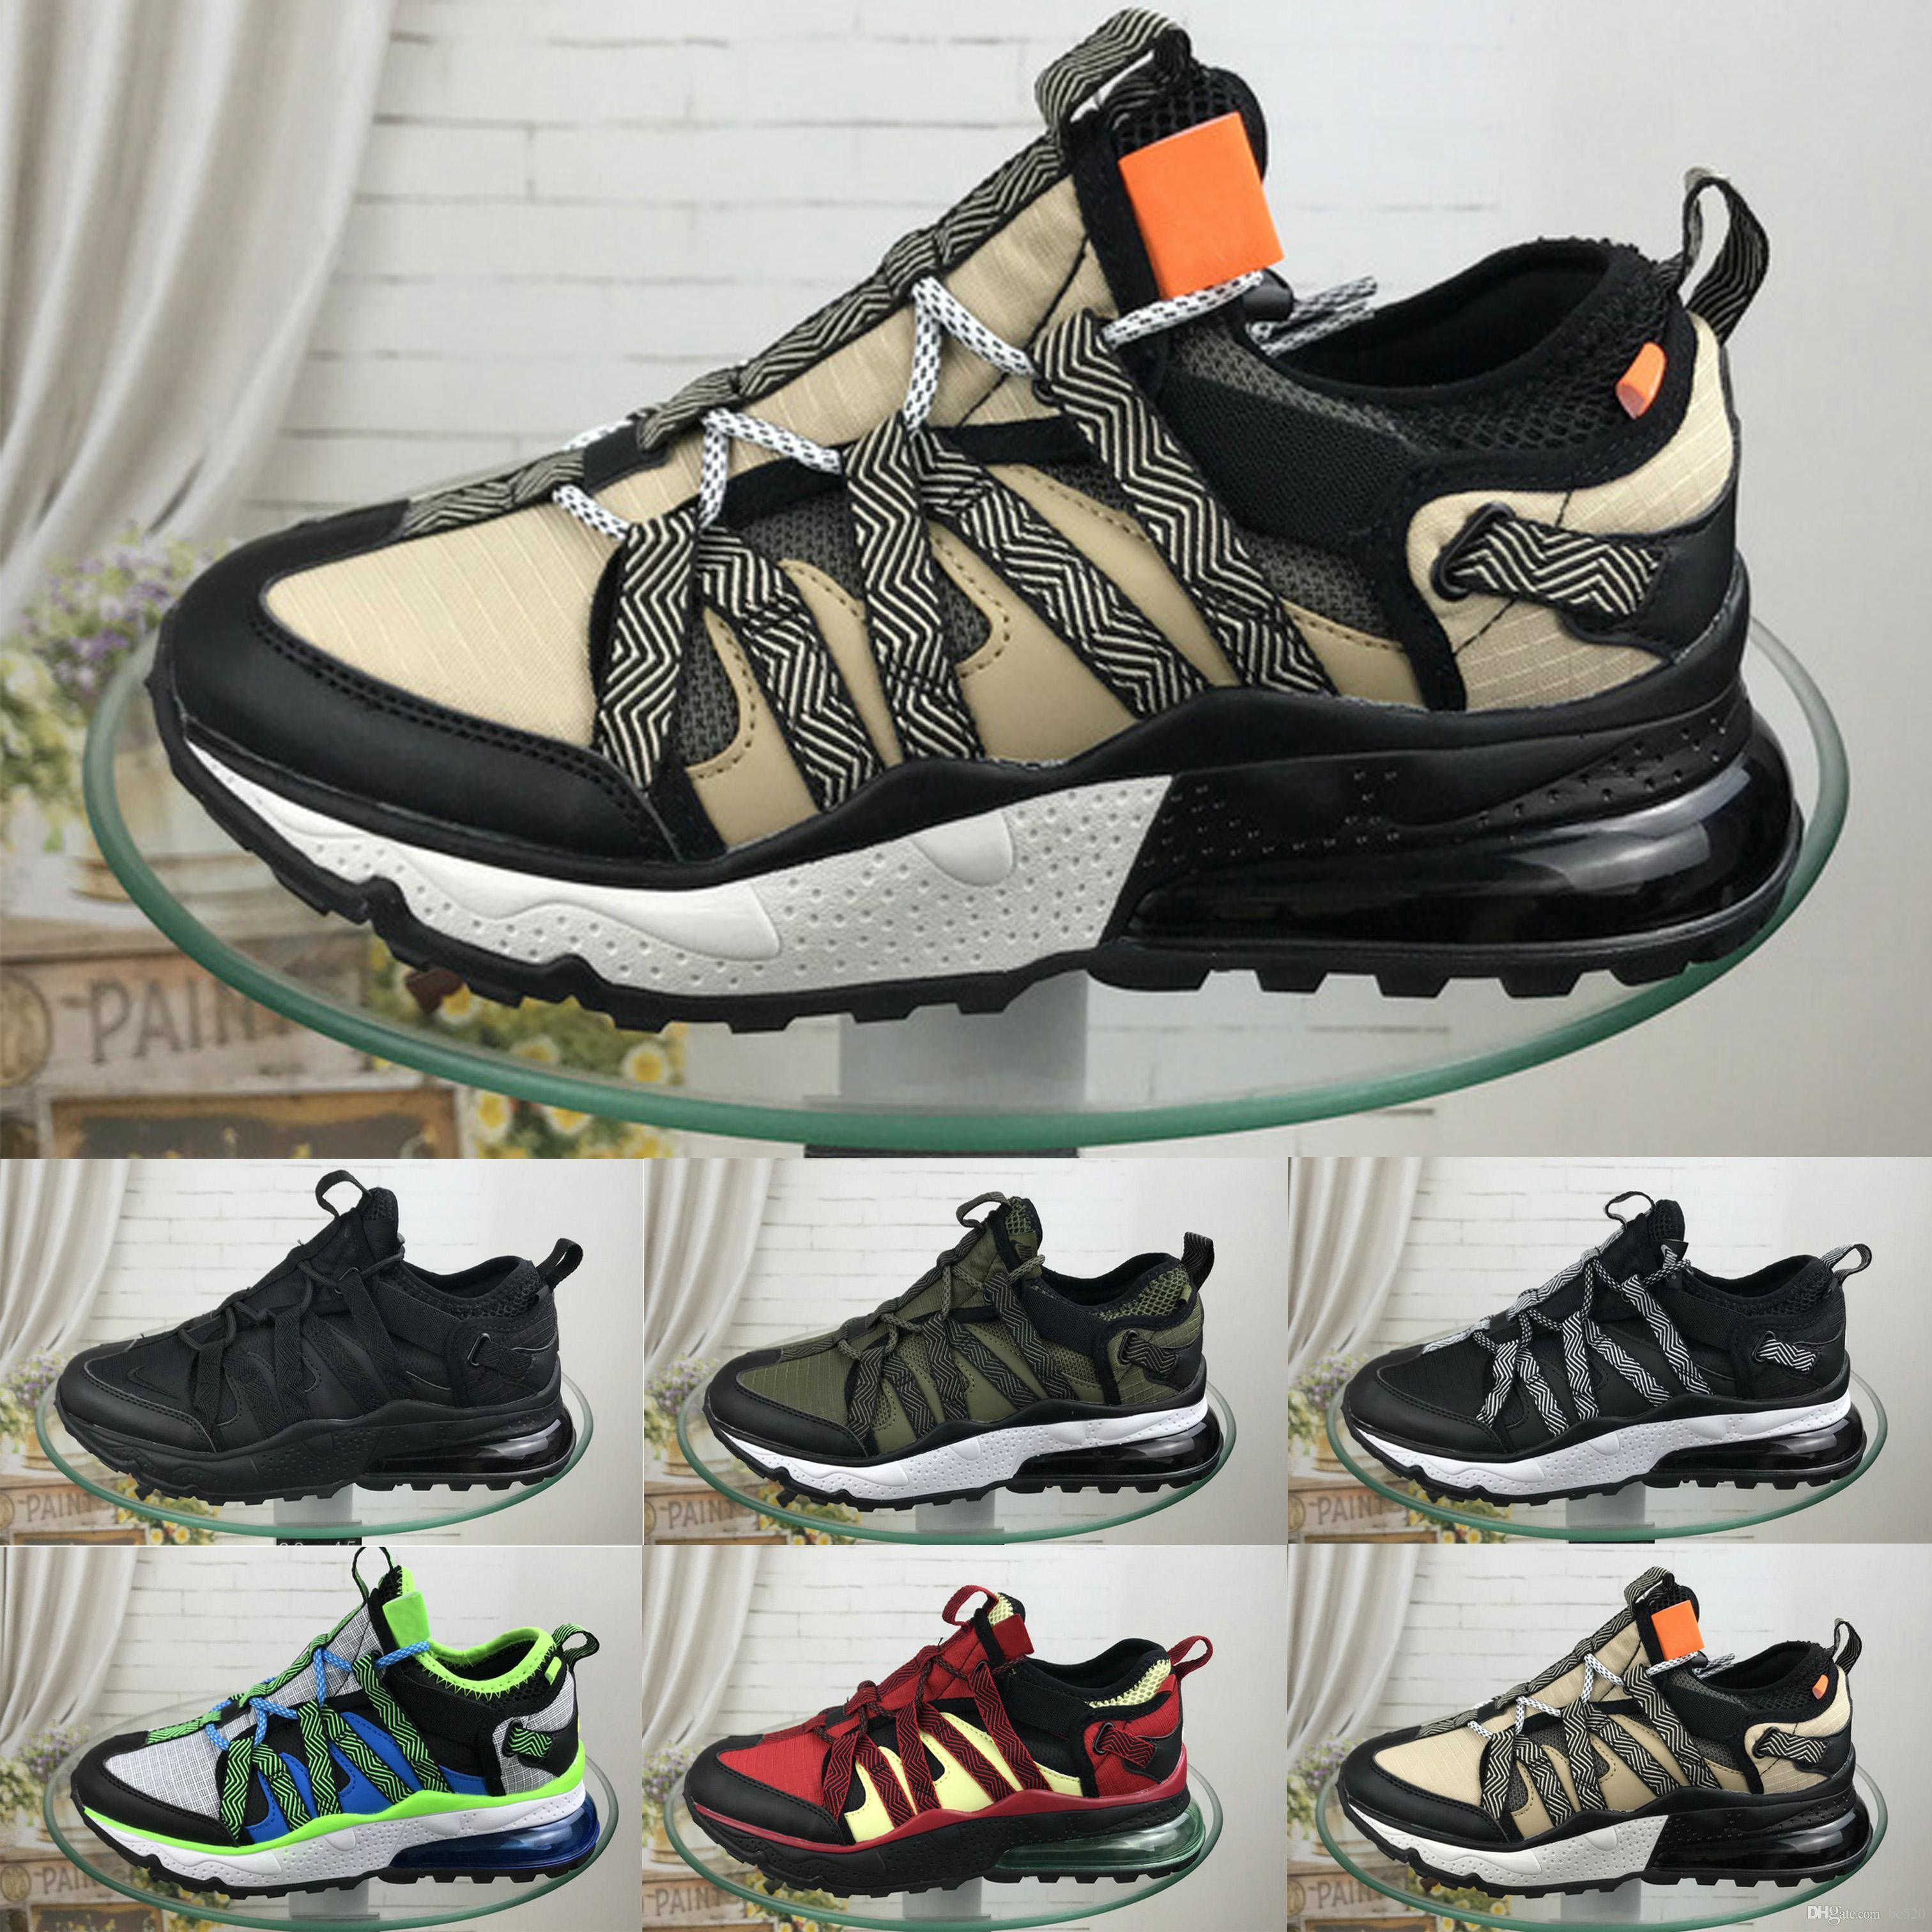 low priced d9aa8 78562 Compre 2019 Nuevo Estilo NIKE AIR MAX 270 BOWFIN Zapatos Para Correr Para  Hombre 270 Bowfin Deporte Atlético Zapatillas Hombre Zapatos De Diseñador  Para ...